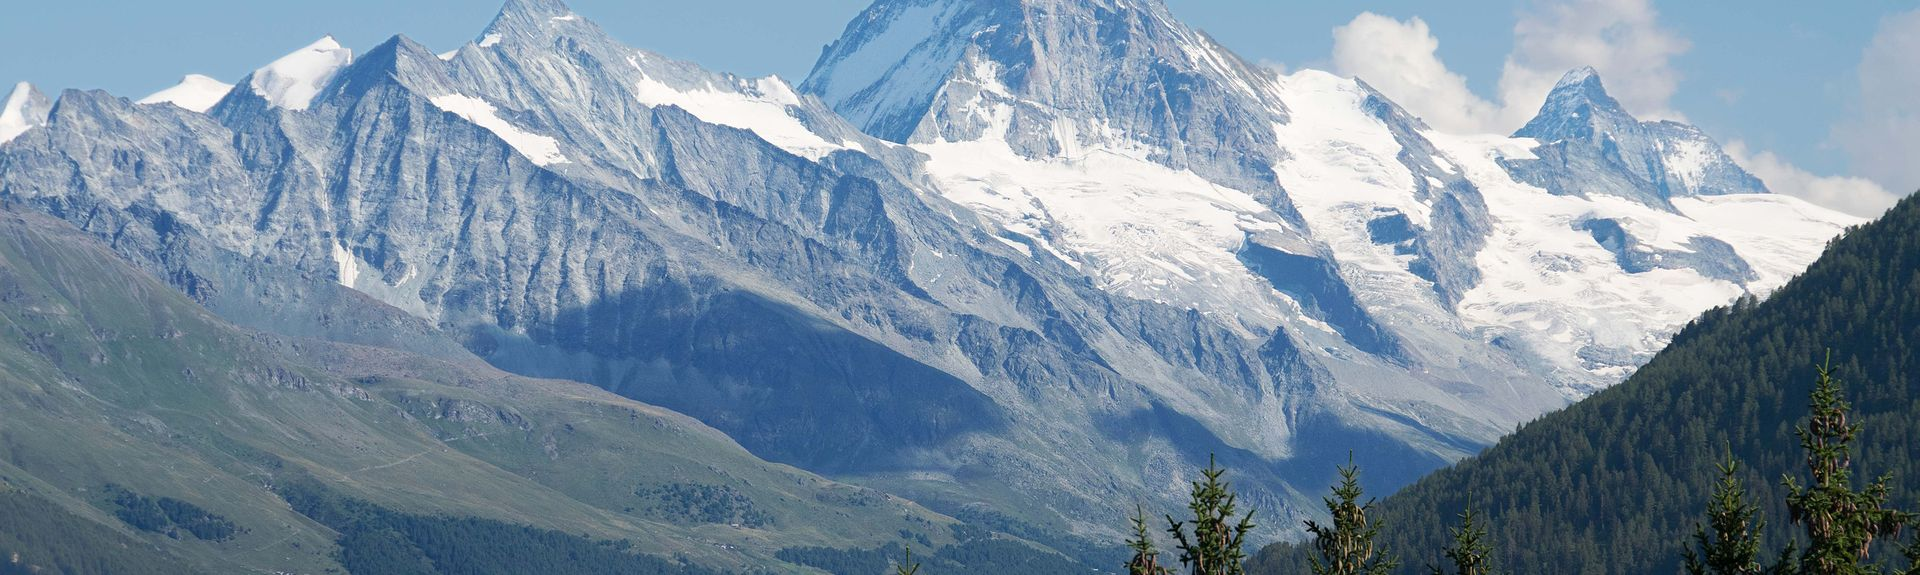 Randogne, Valais, Suisse